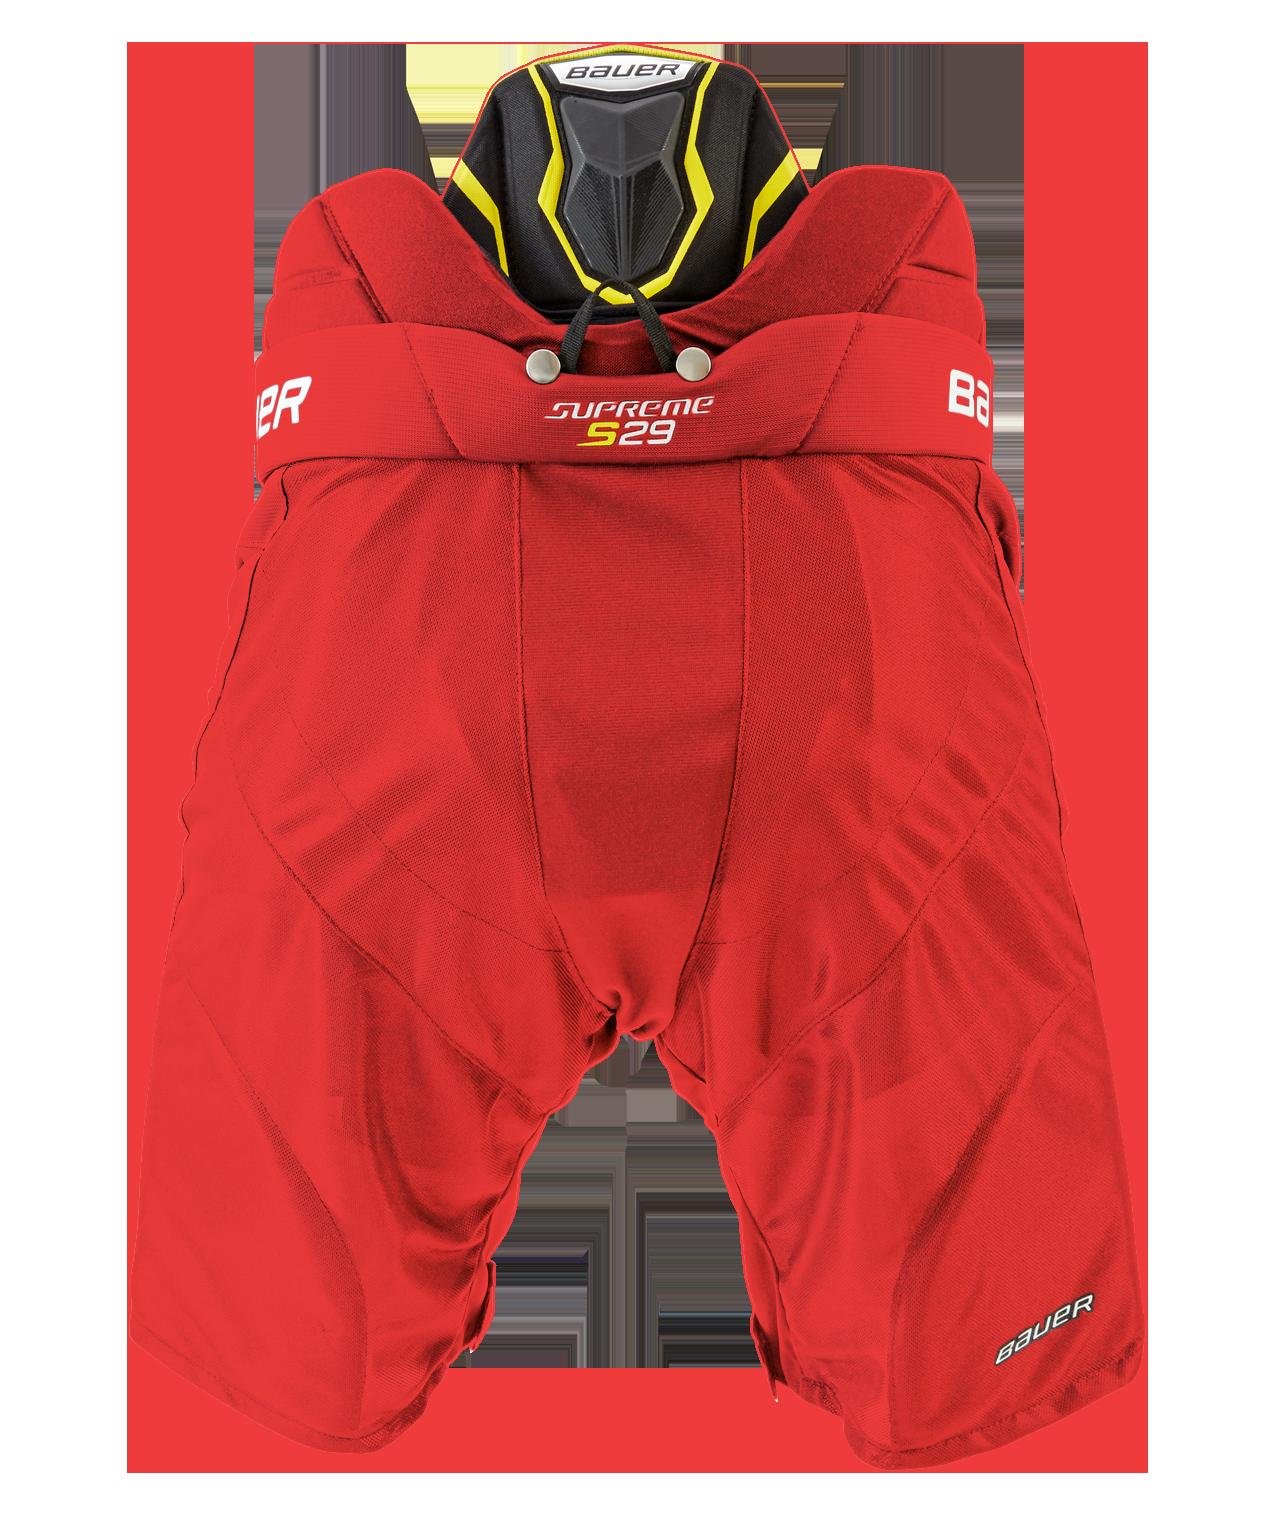 Supreme S29 Pants Junior